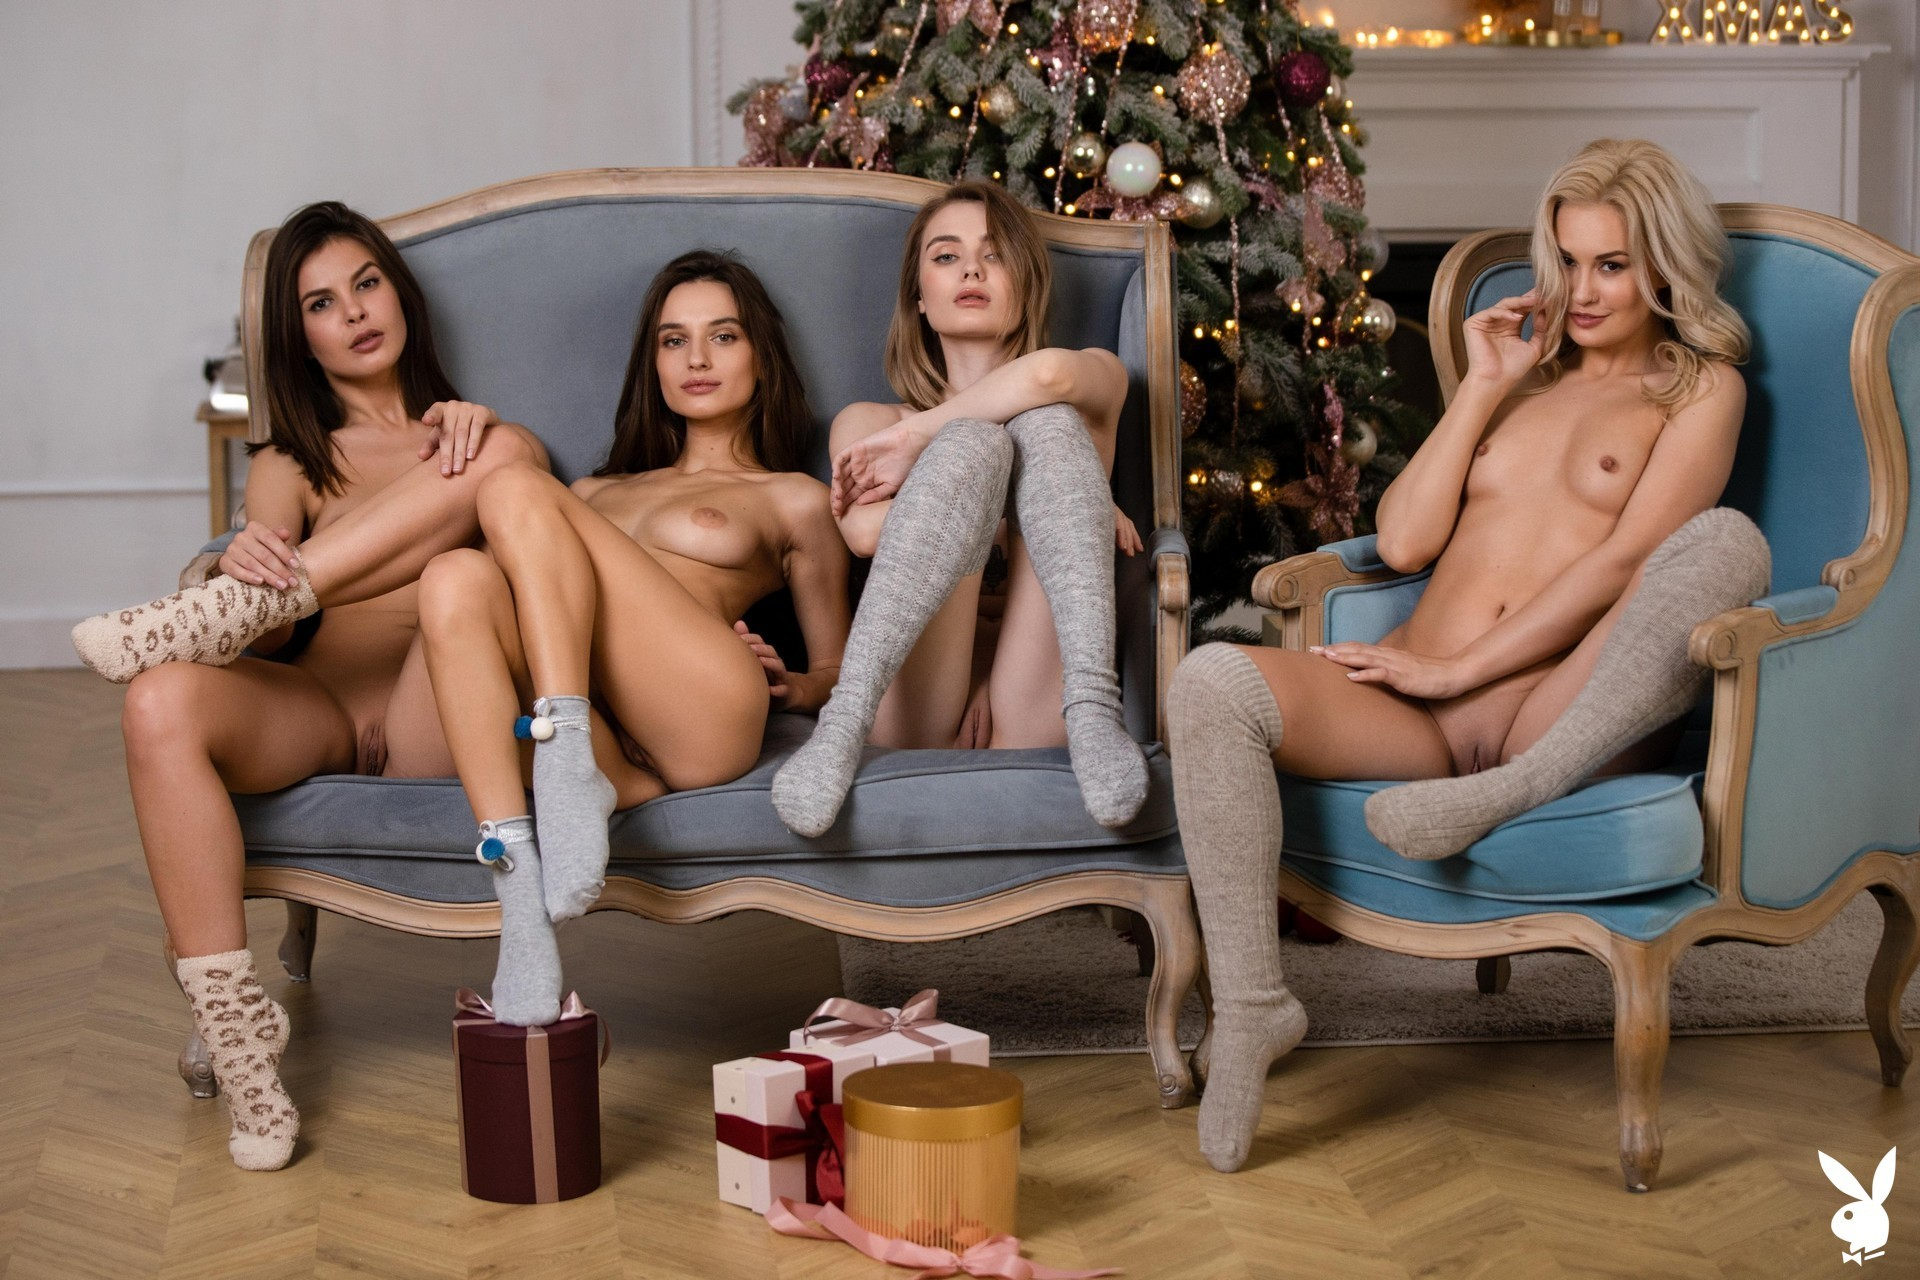 Winter Favorites Playboy Plus Alice Shea, Demi Fray, Erika Knight, Gloria Sol, Justine Miller, Kate Jones, Khloë Terae, Scarlett Sage, Vivienne Solange (24)